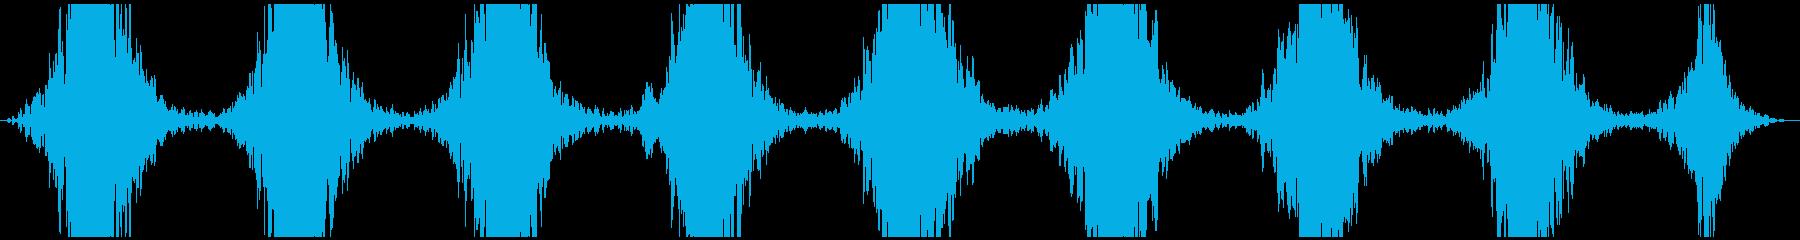 PADS 回転する地震01の再生済みの波形